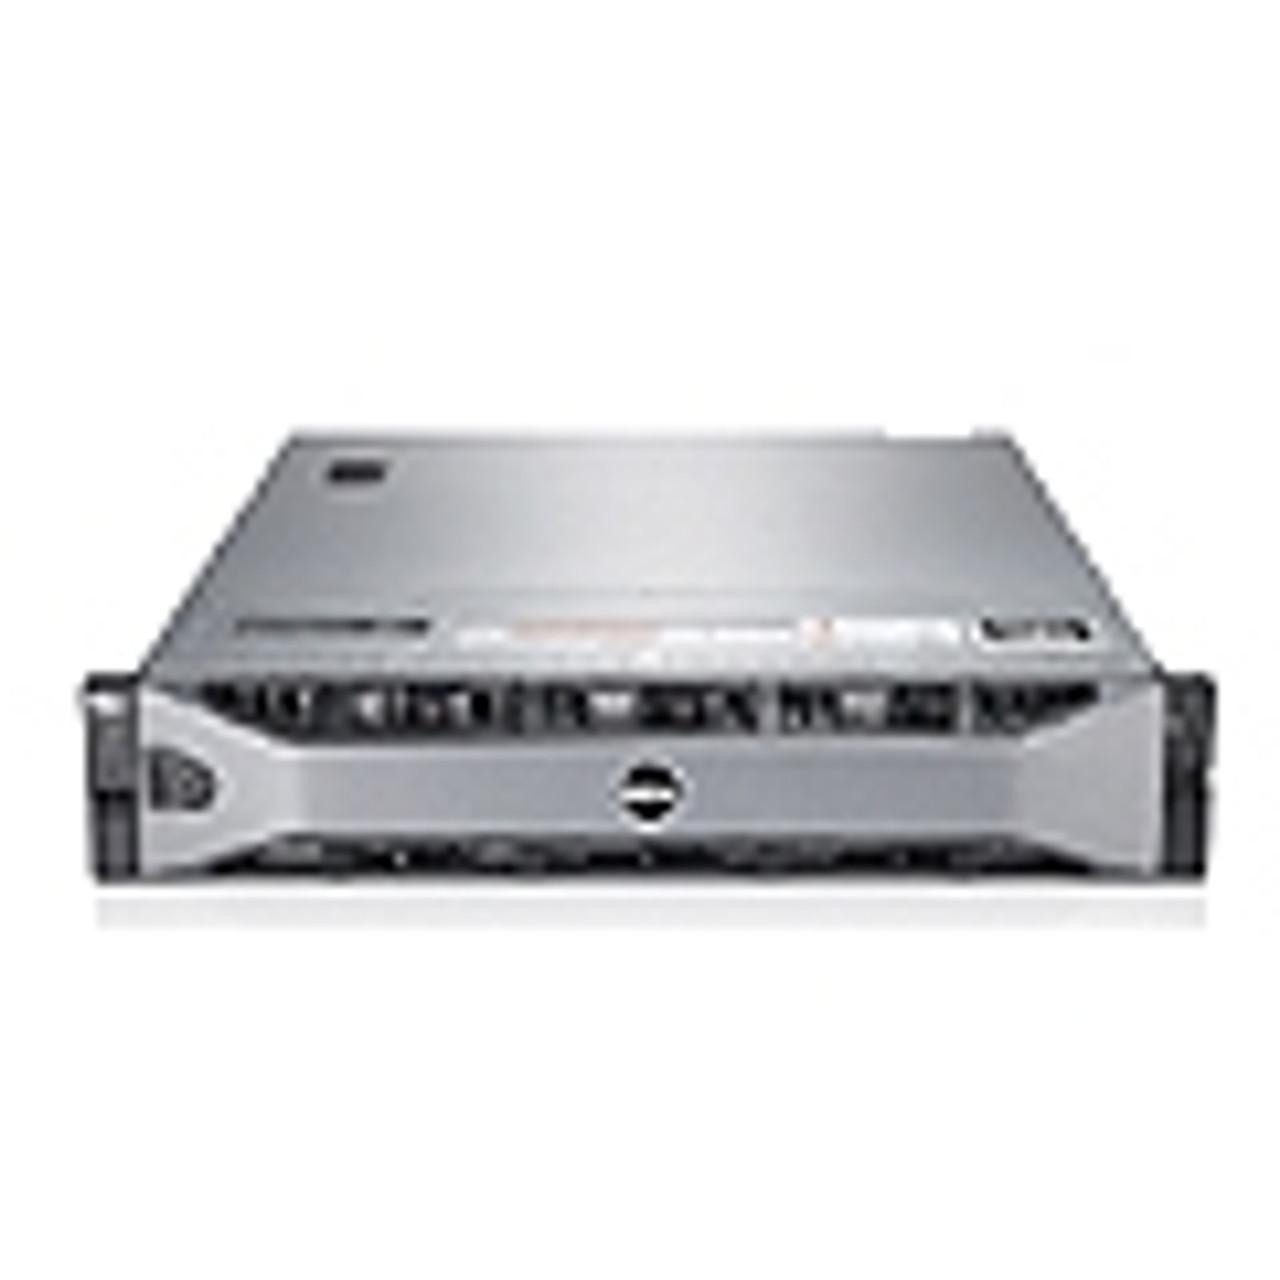 Dell PowerEdge R720xd Servers